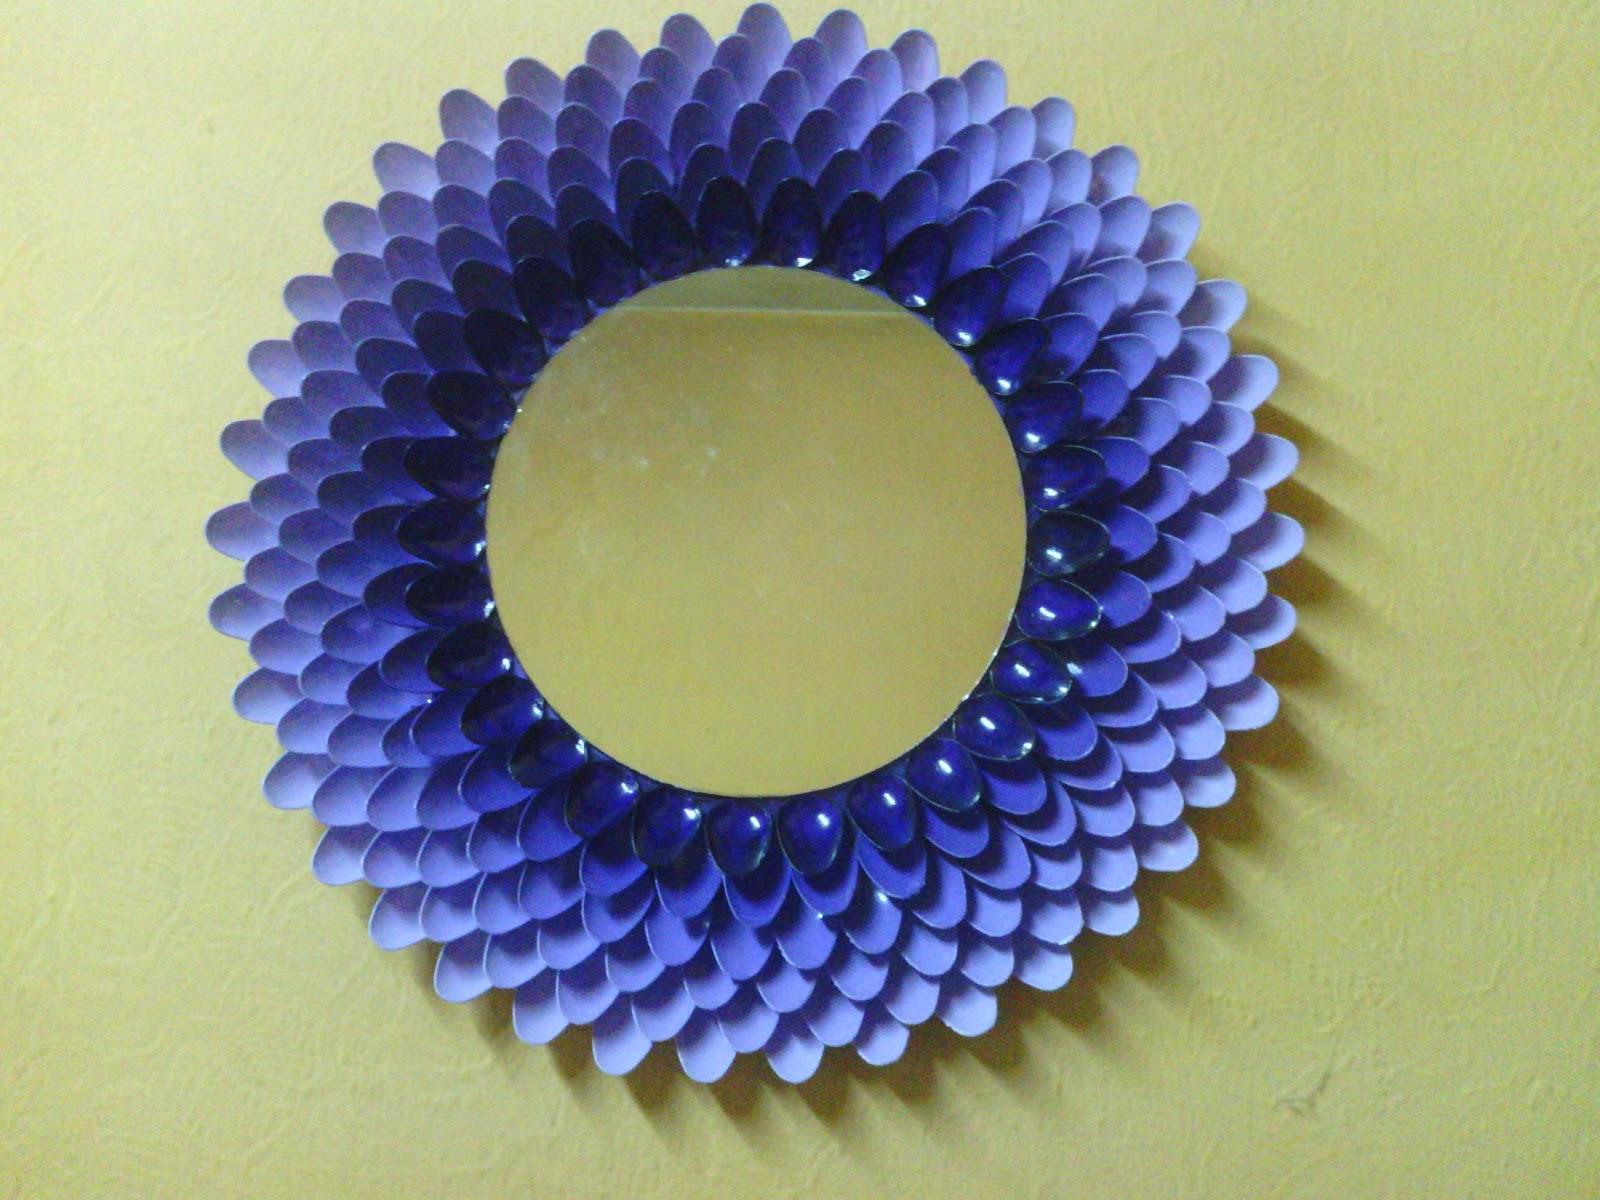 Antonia cristiani design espejo for Decoracion de espejo con cucharas